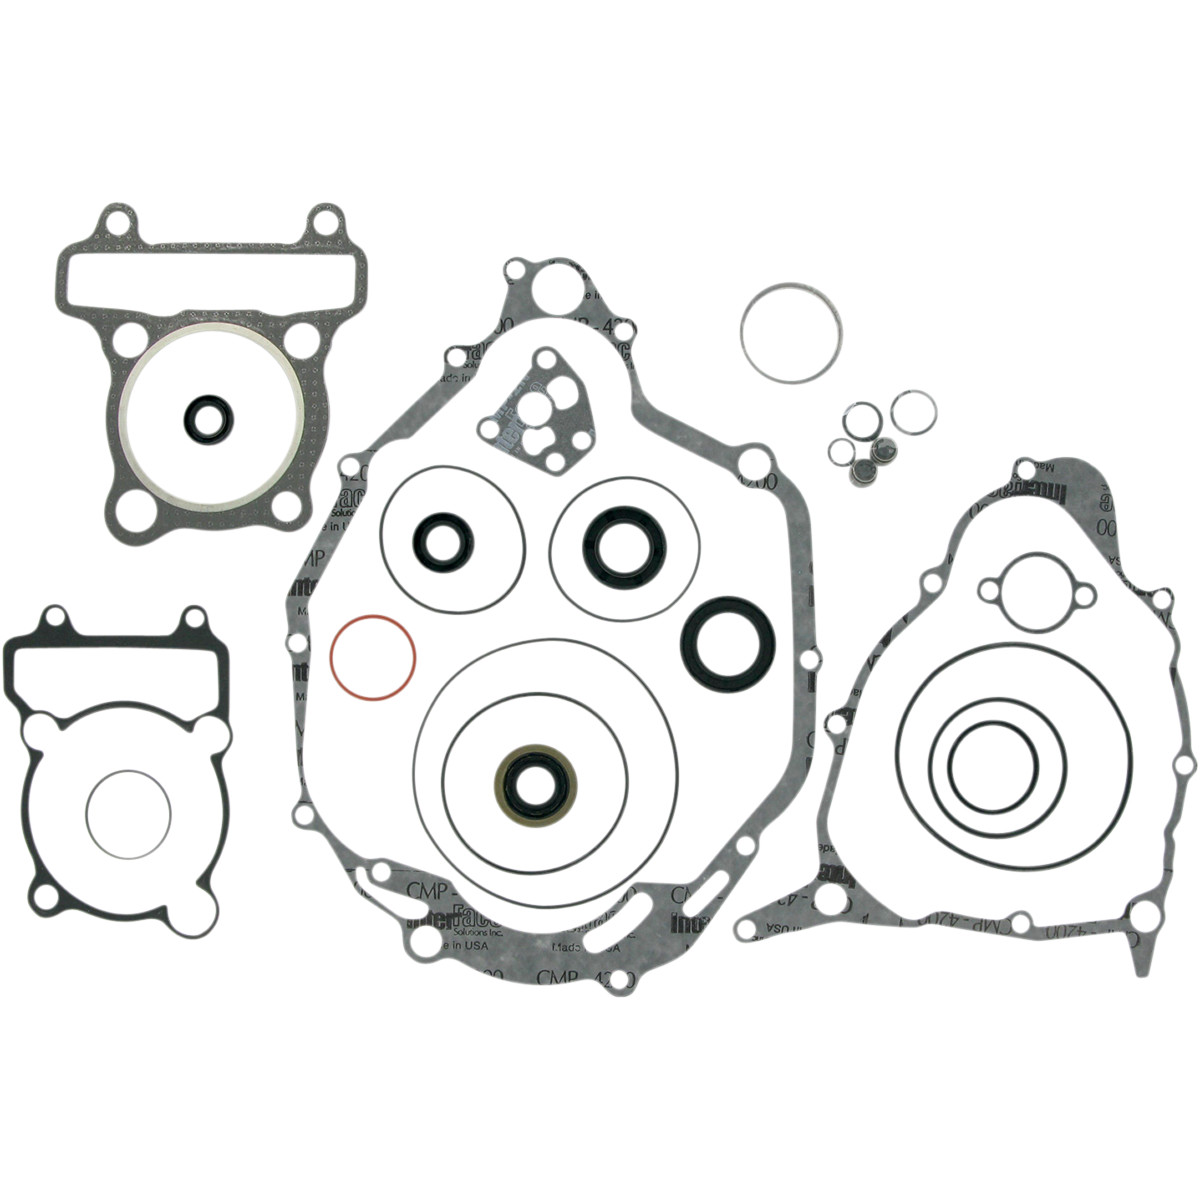 Moose Racing Complete Engine Gasket Kit W Oil Seals